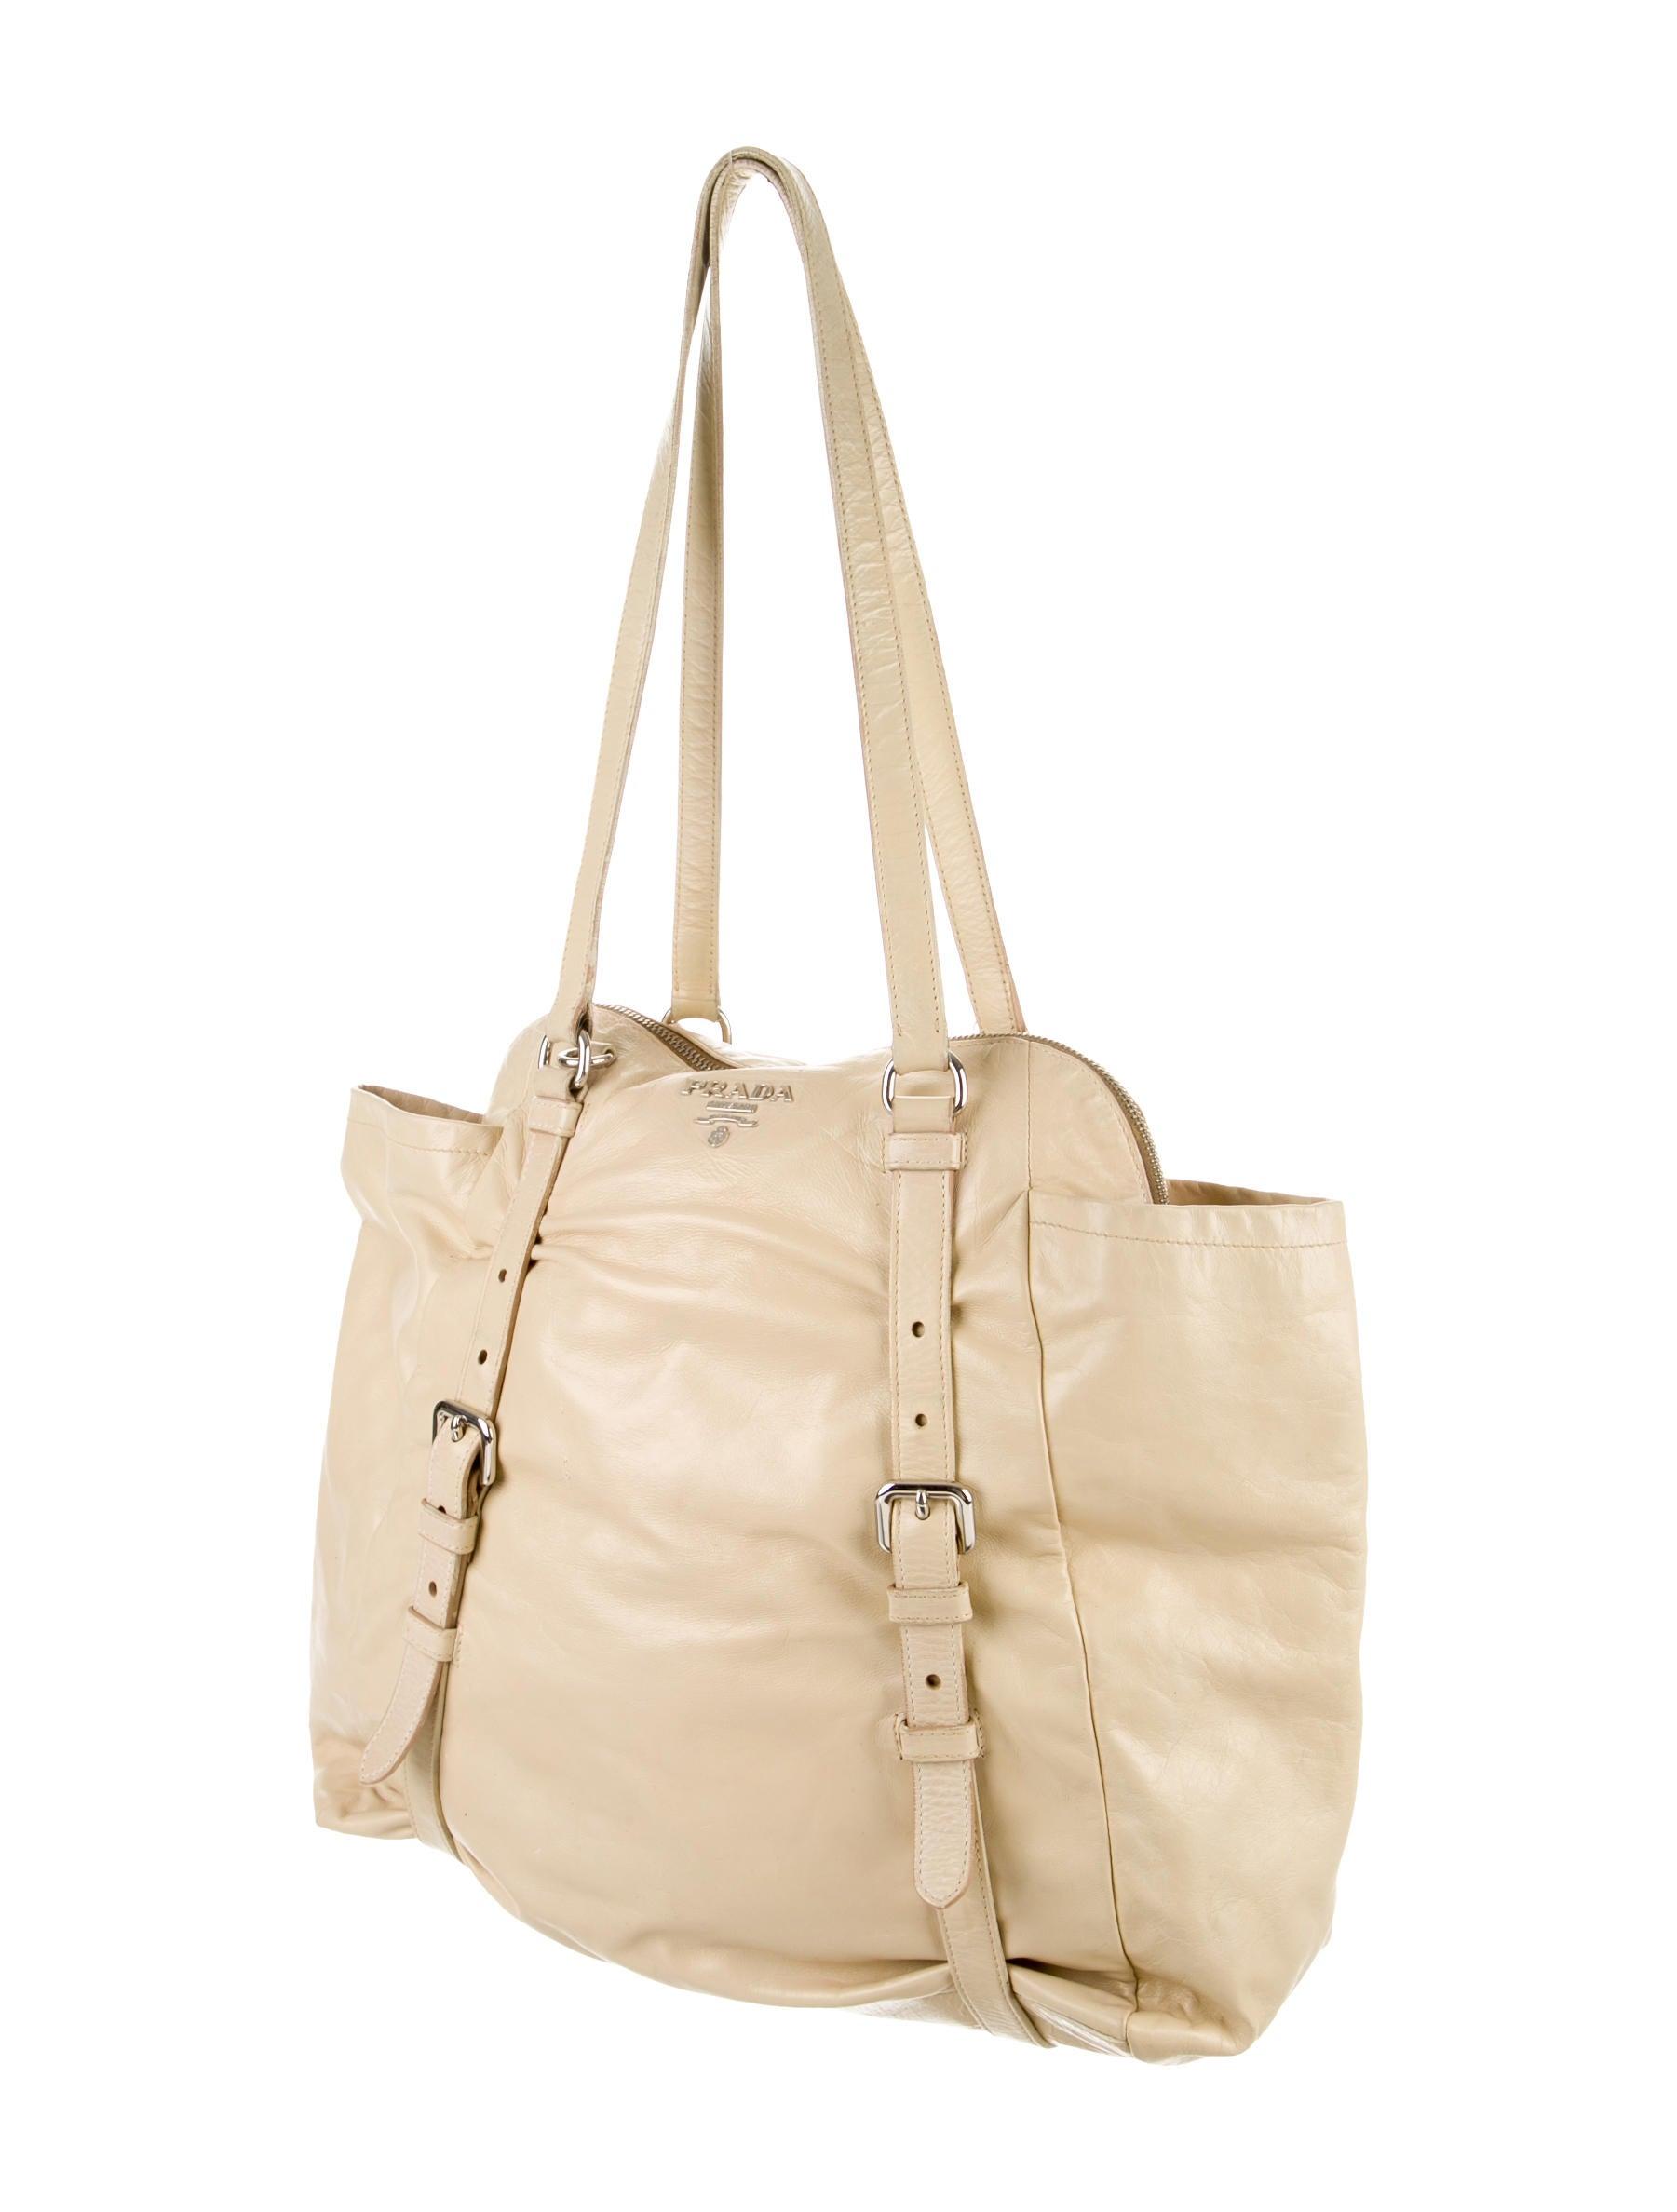 prad bag - Prada Cervo Leather Satchel - Handbags - PRA83101 | The RealReal